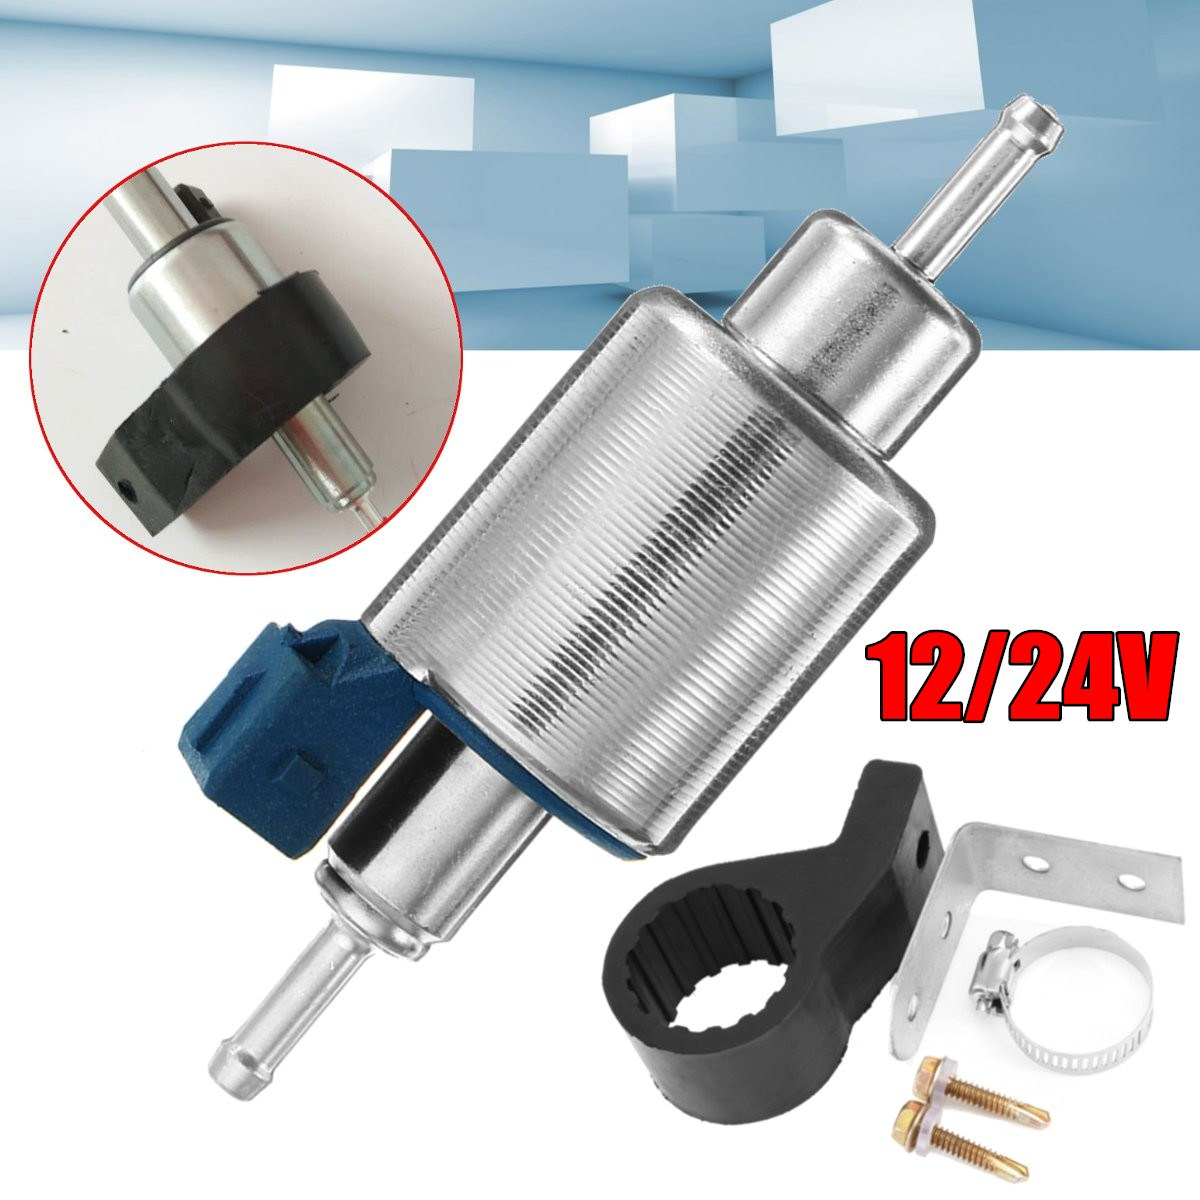 Bosch Car Fuel Pump Petrol Gasoline Bracket Assembly For Gm Electric 12v 24v Universal Diesel More Eberspacher Heaters